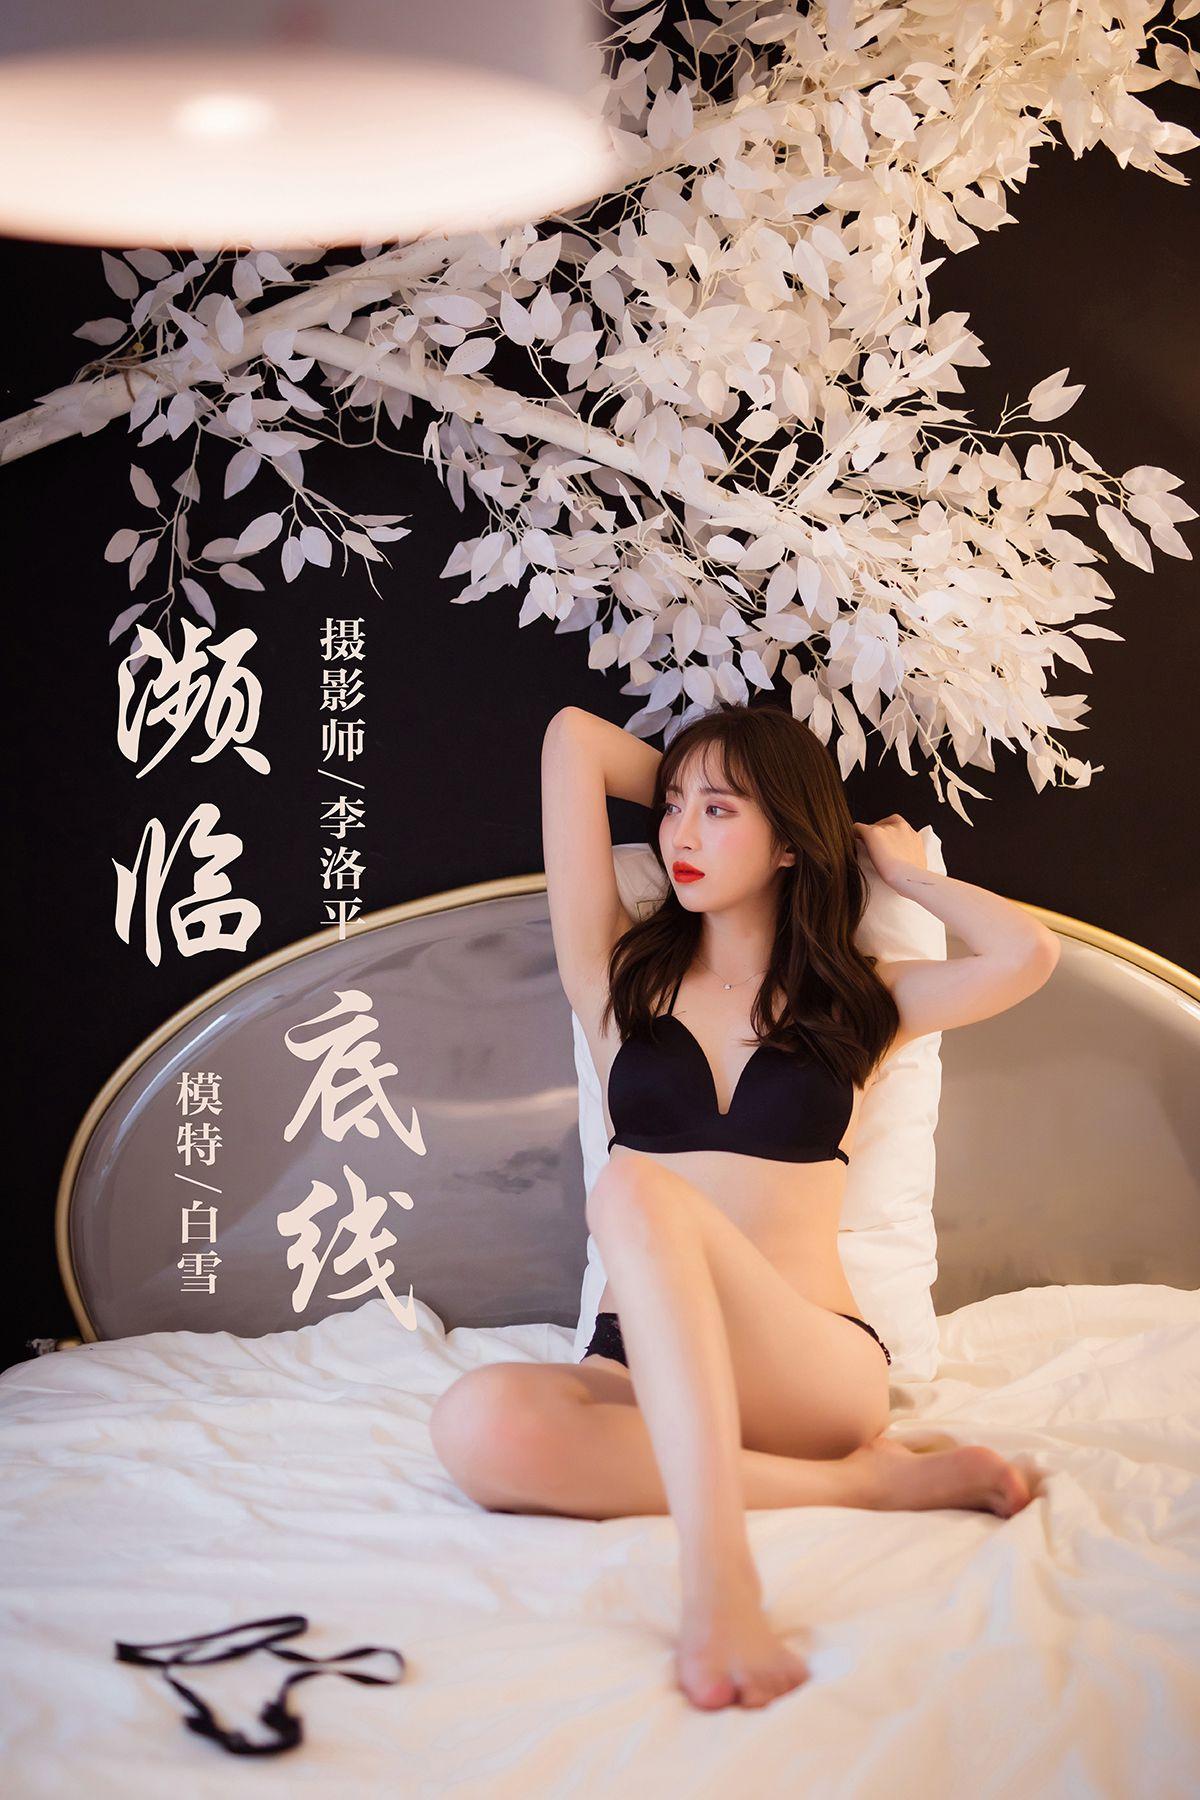 YaLaYi雅拉伊 Vol.462 Bai Xue